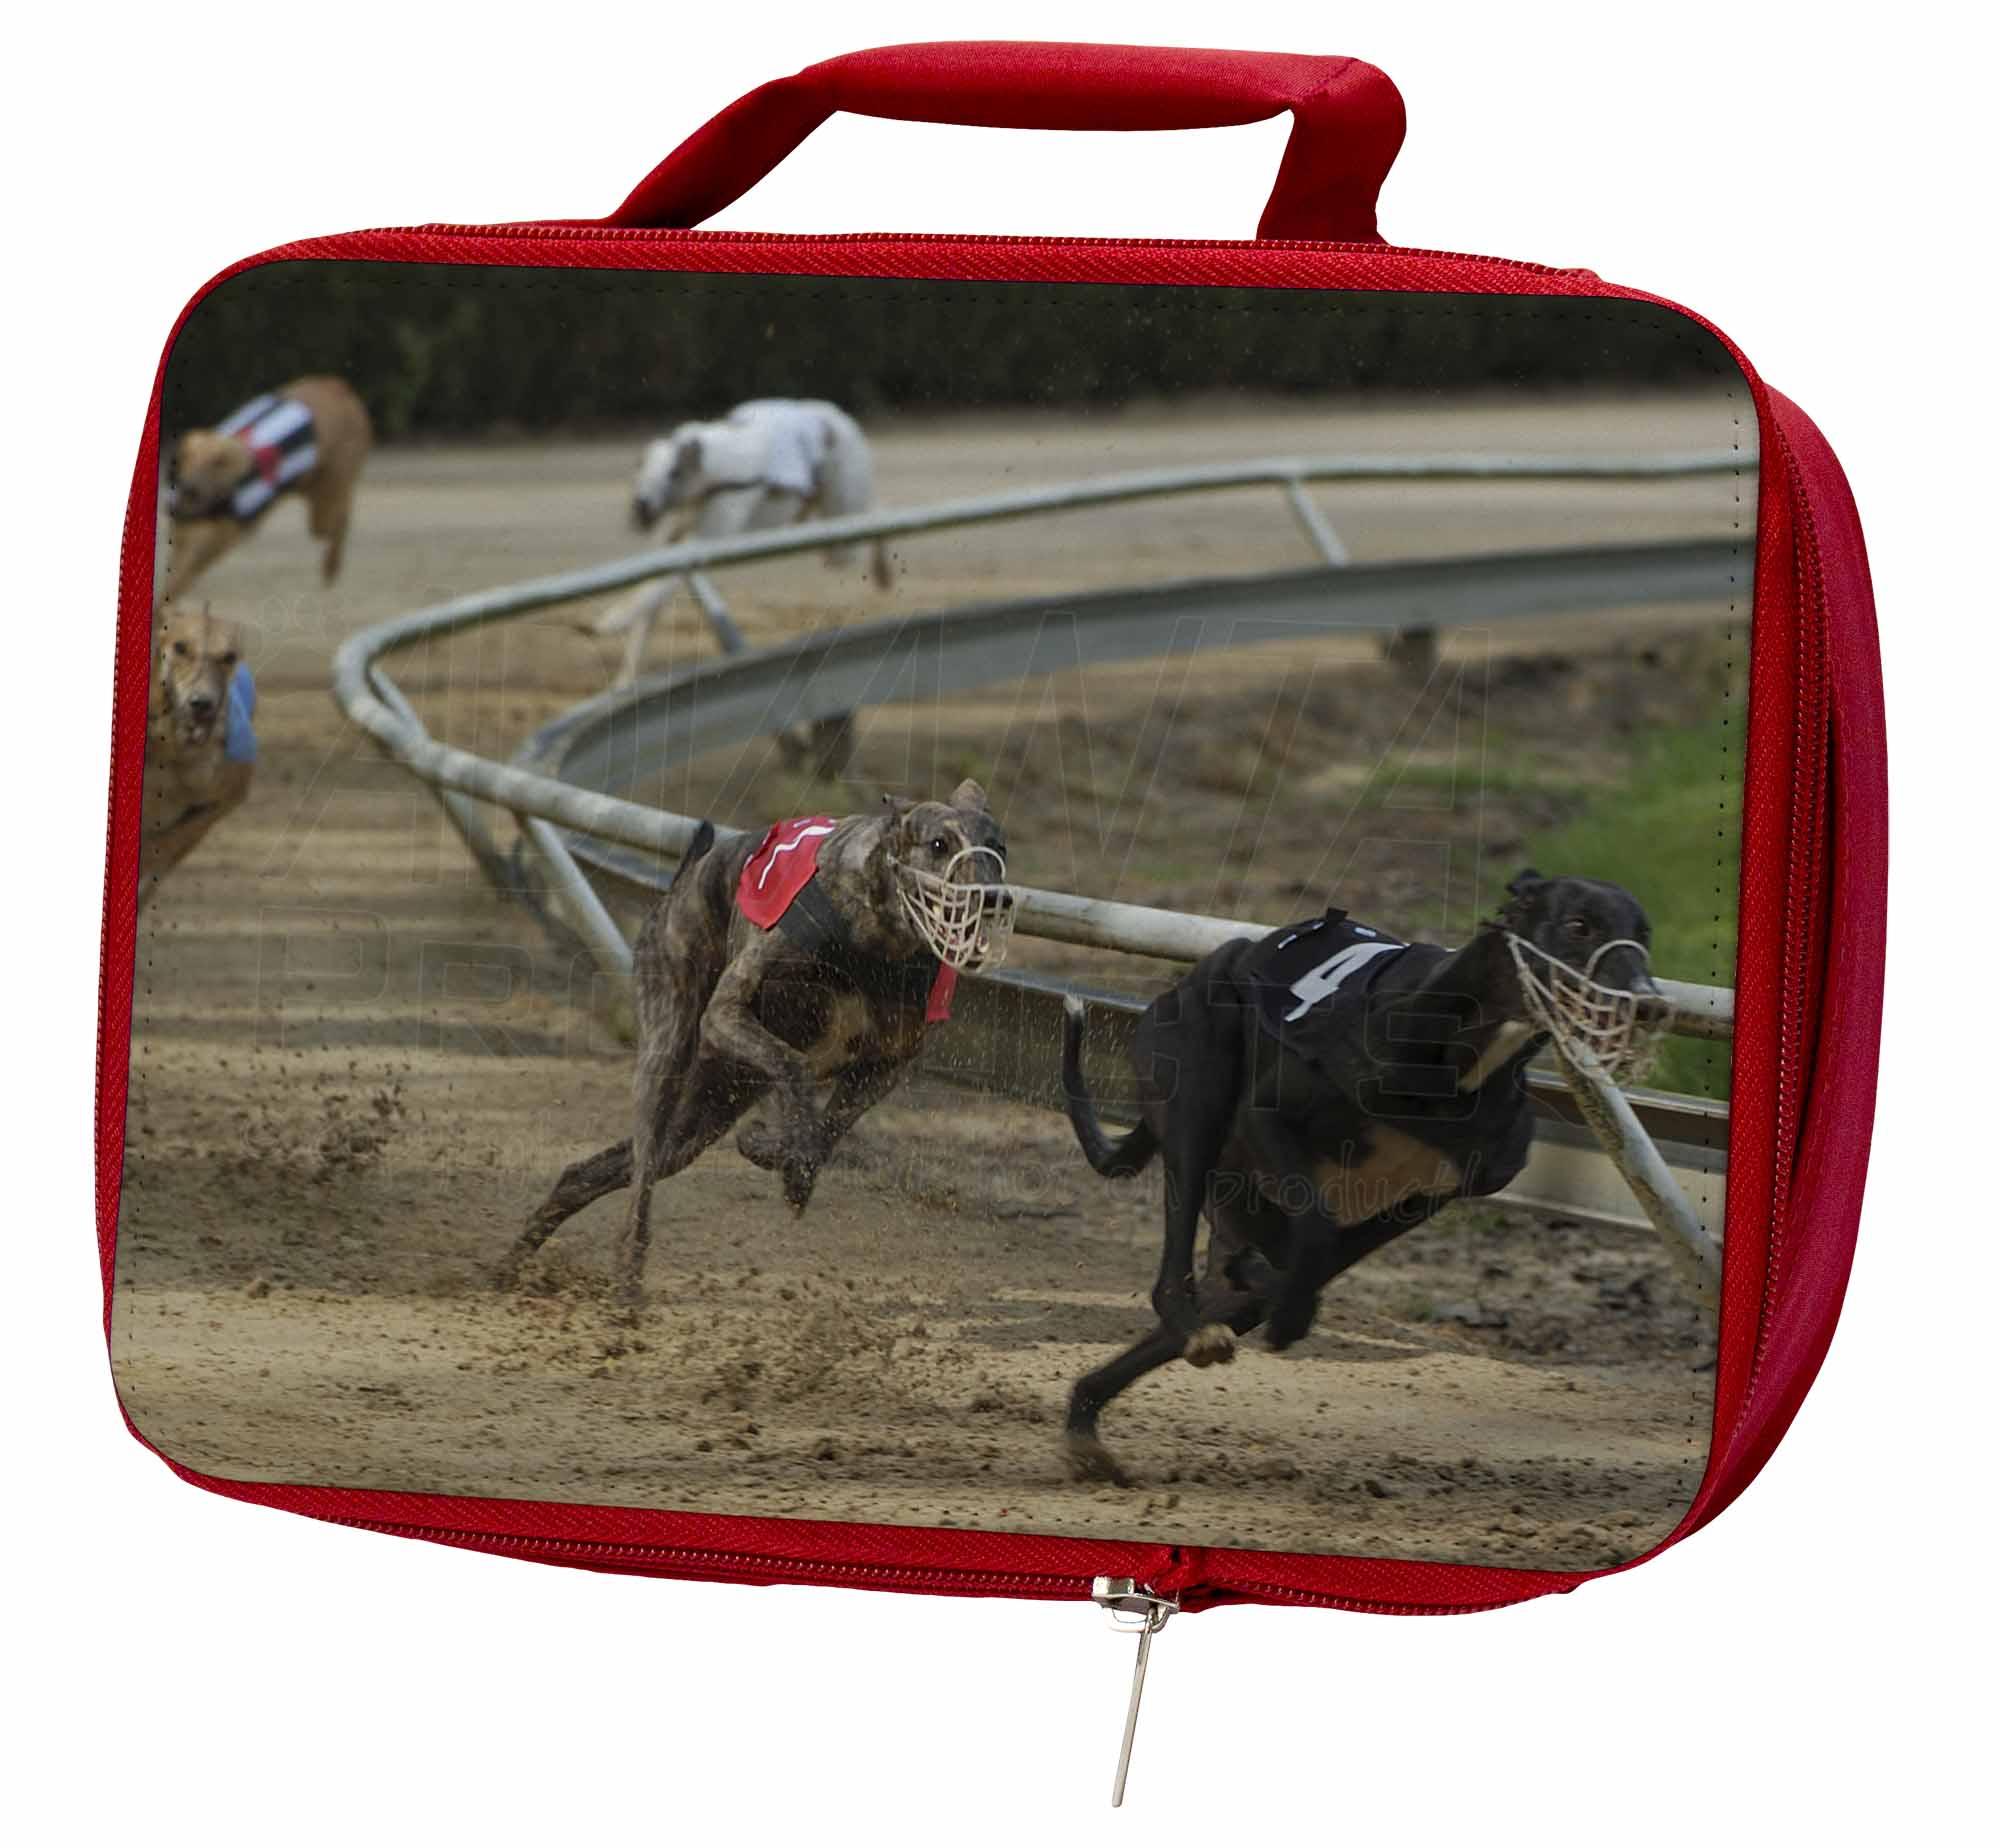 Greyhound Dog AD-GH1LBR Racing Insulated Red School Lunch Box/Picnic Bag, AD-GH1LBR Dog b53e30